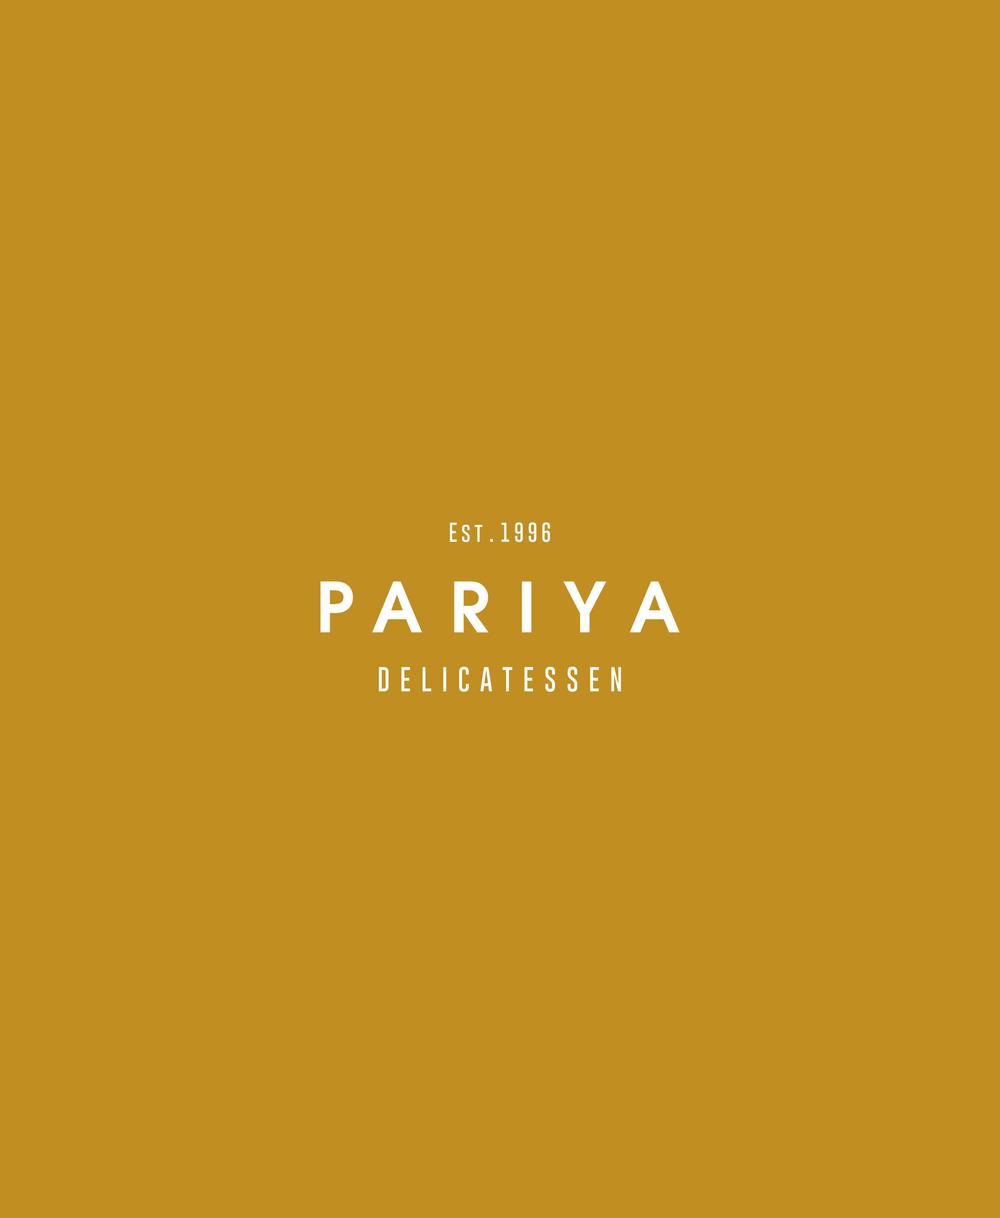 pariya_02.png